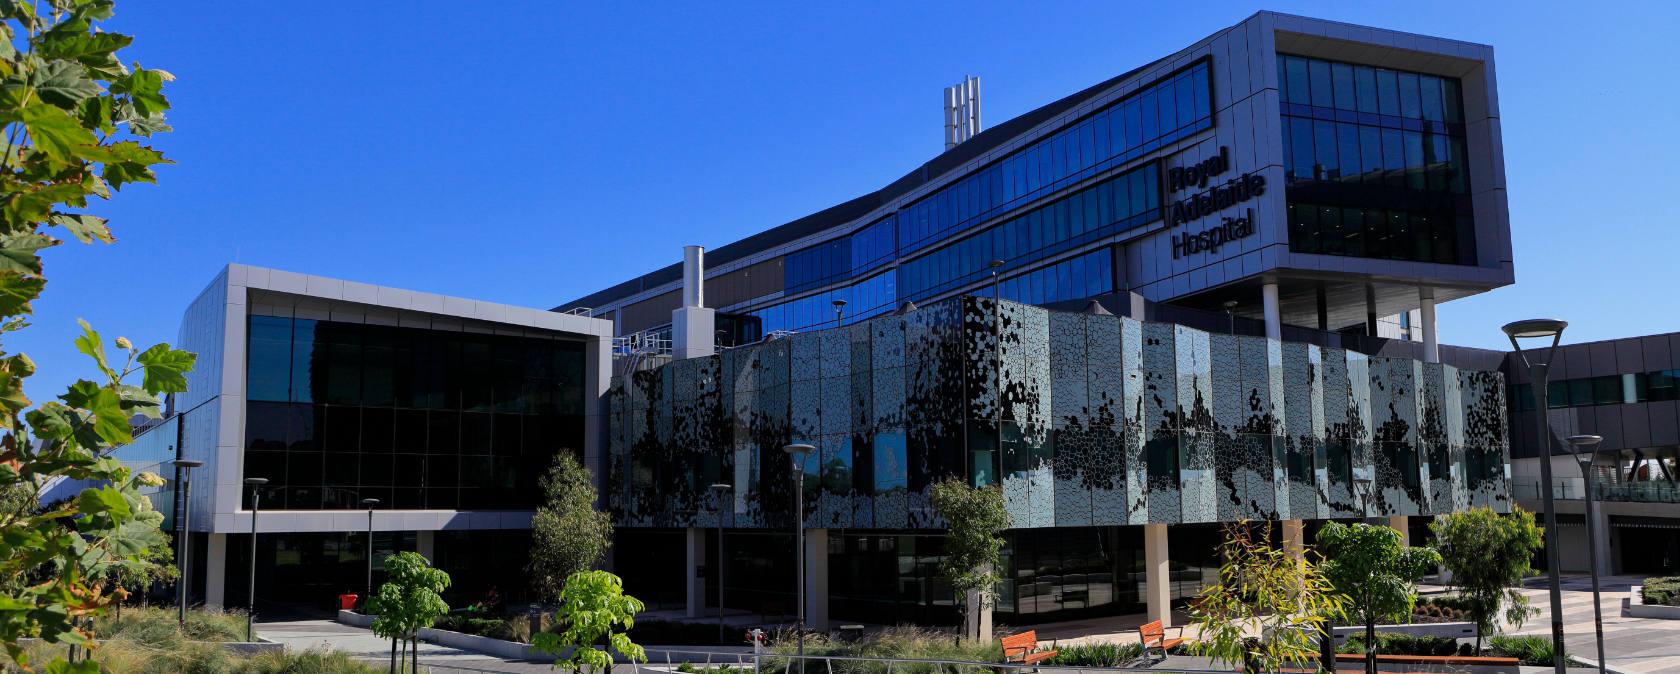 New Royal Adelaide Hospital building